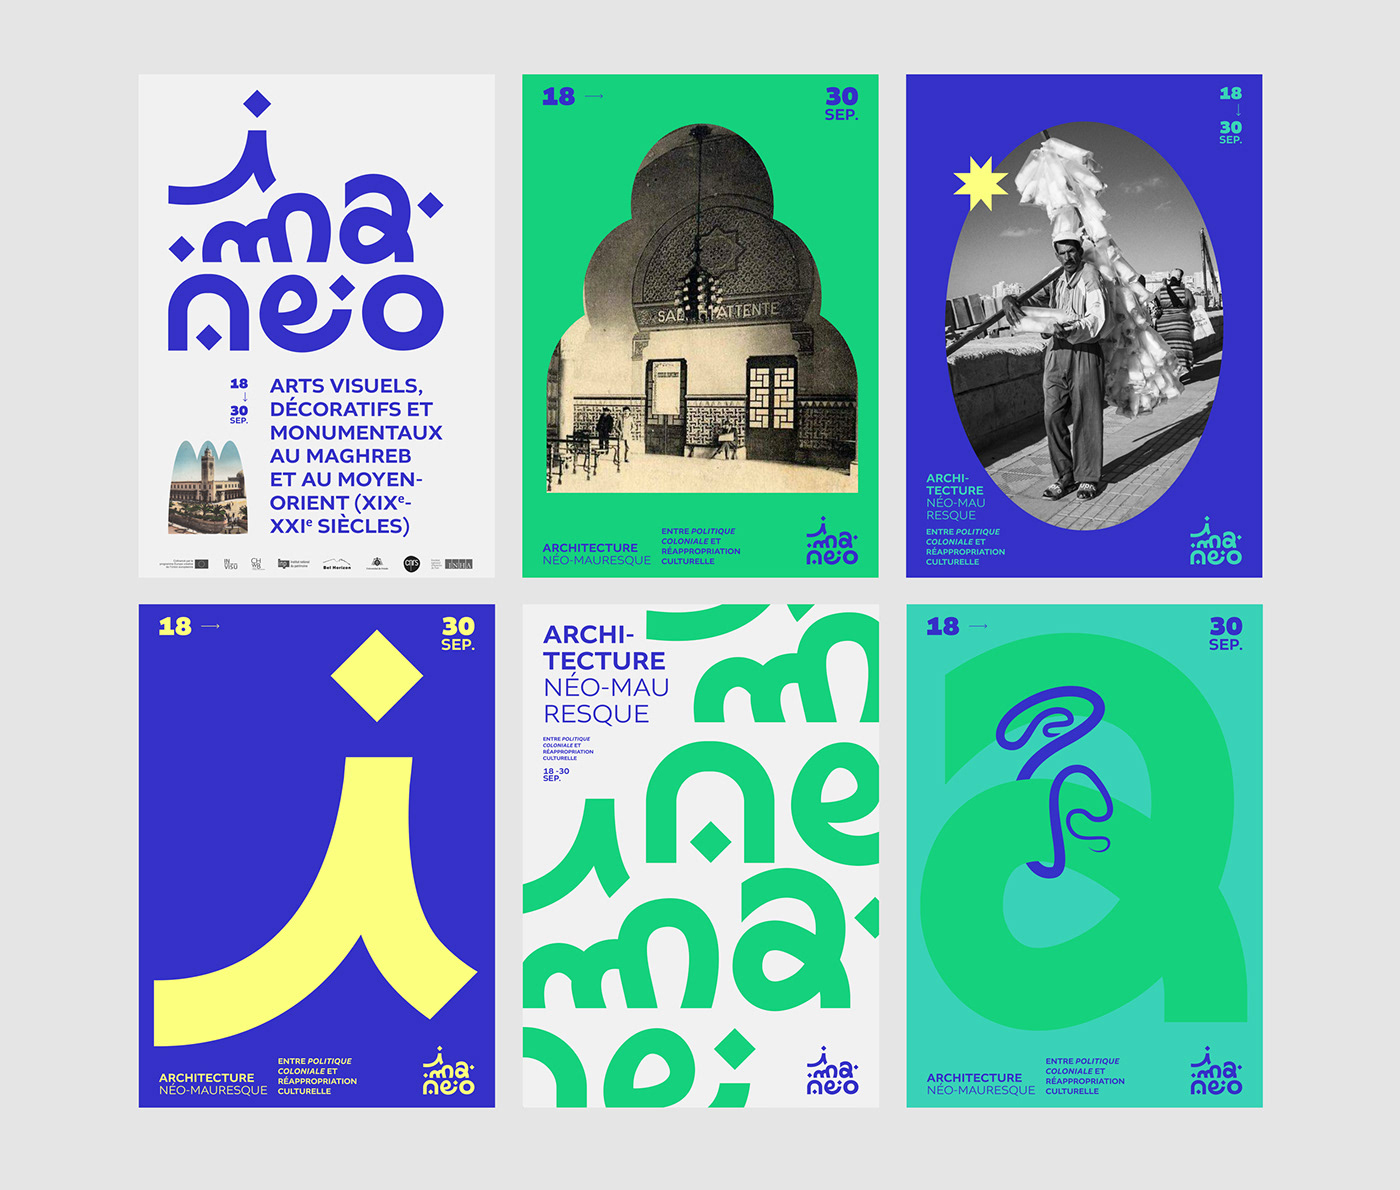 arabian architecture art nouveau cultural history identity logo neo moorish occident Orient